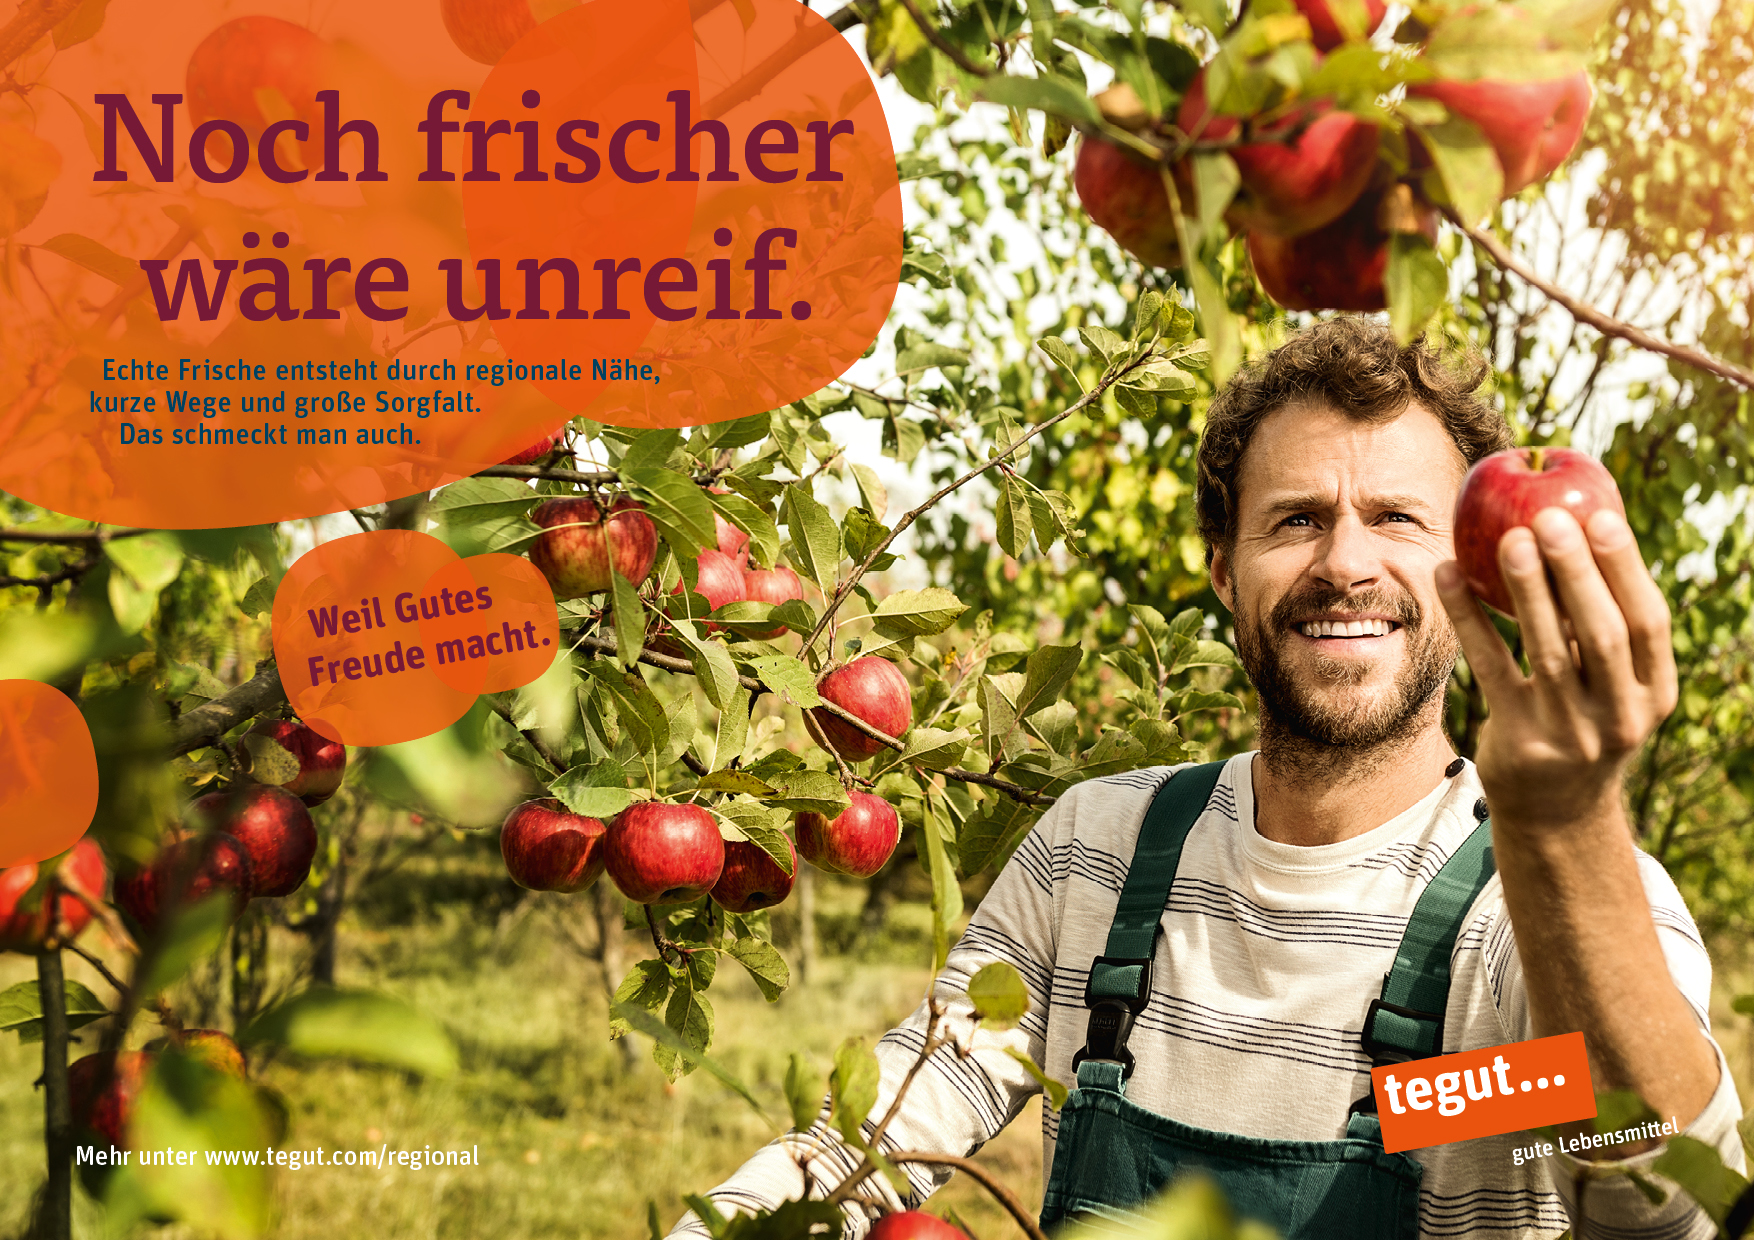 tg_kampagnenmotive_frische_1611025.jpg